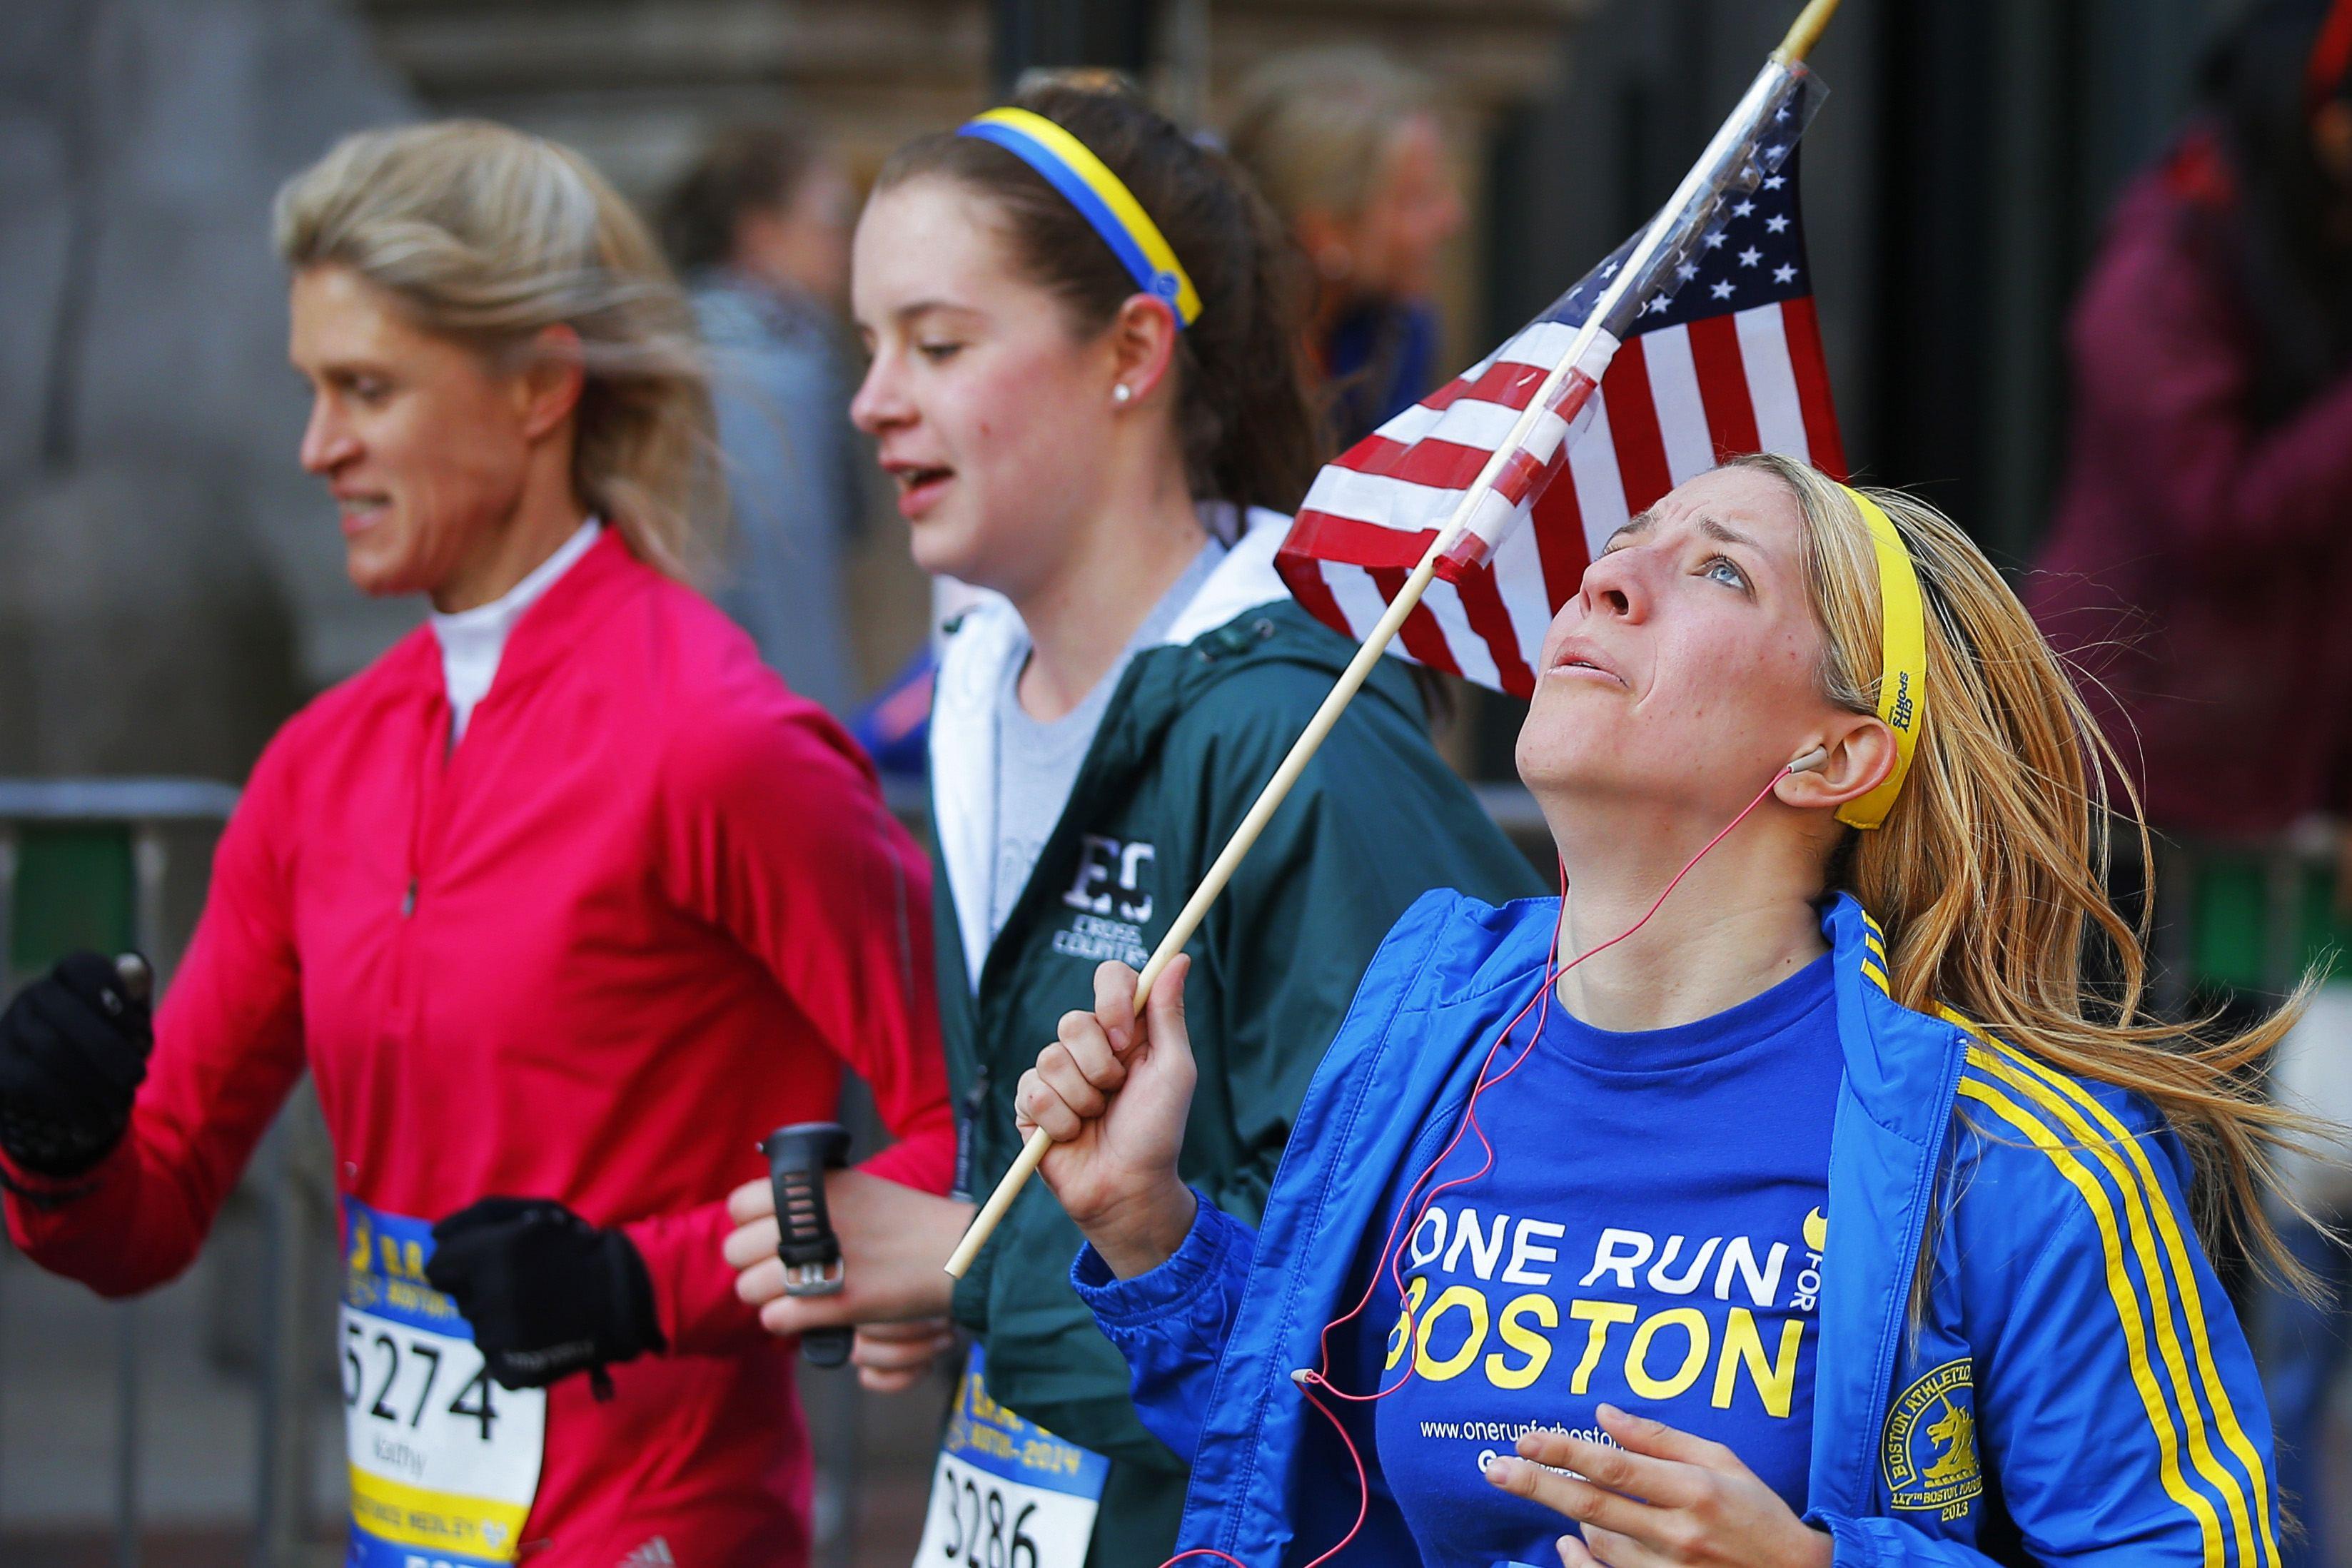 Running for Boston: Tribute run, preparing for the 2014 Marathon